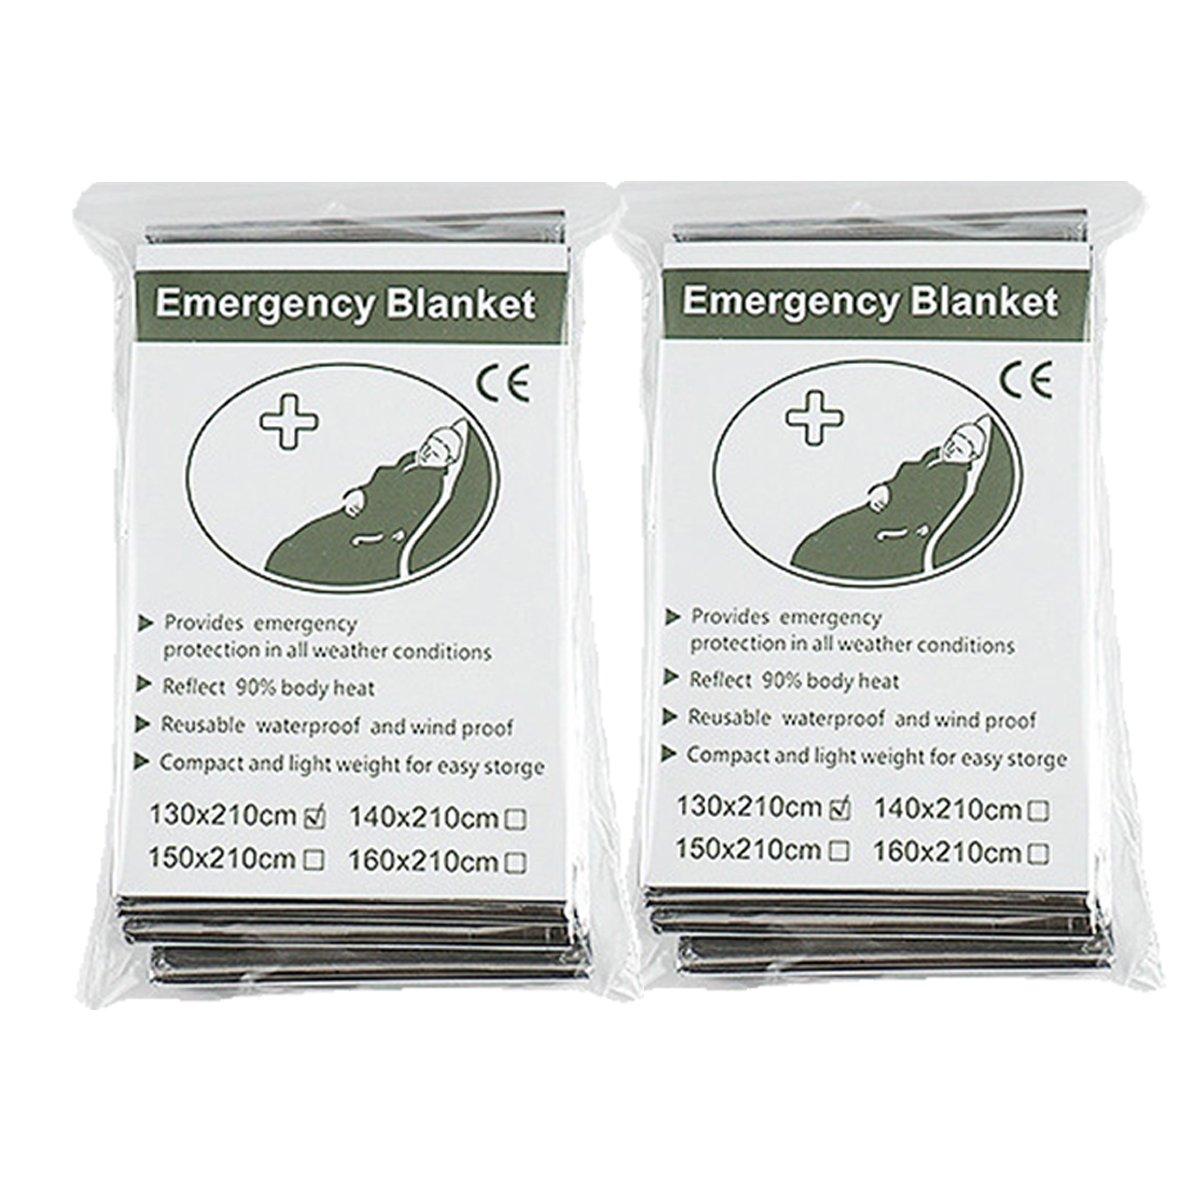 Binhai Mantas de Emergencia, Manta Té rmica, Manta de Emergencia, Mantas de Emergencia 52'x 83' (2-Paquetes) Manta Térmica Mantas de Emergencia 52x 83 (2-Paquetes) DHBJT